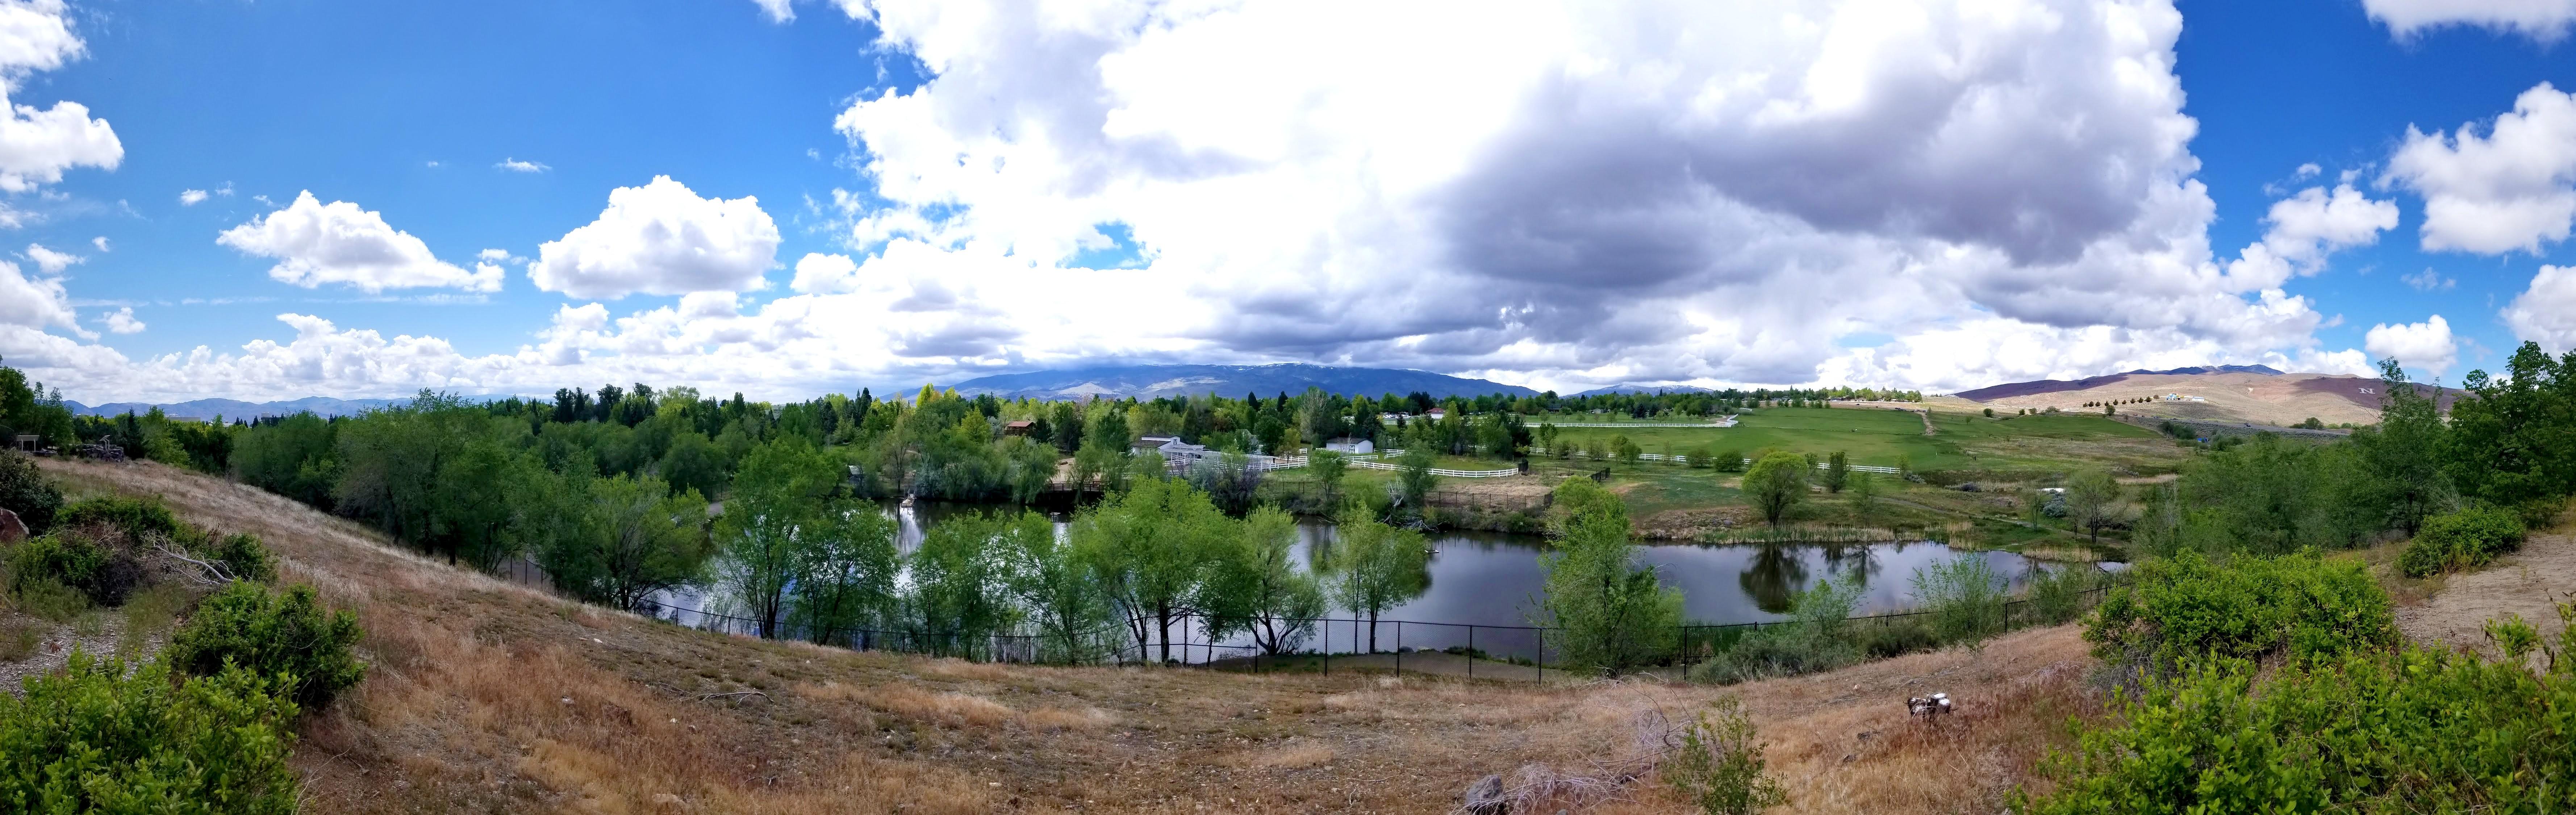 Washoe County, State of Nevada   LinkedIn